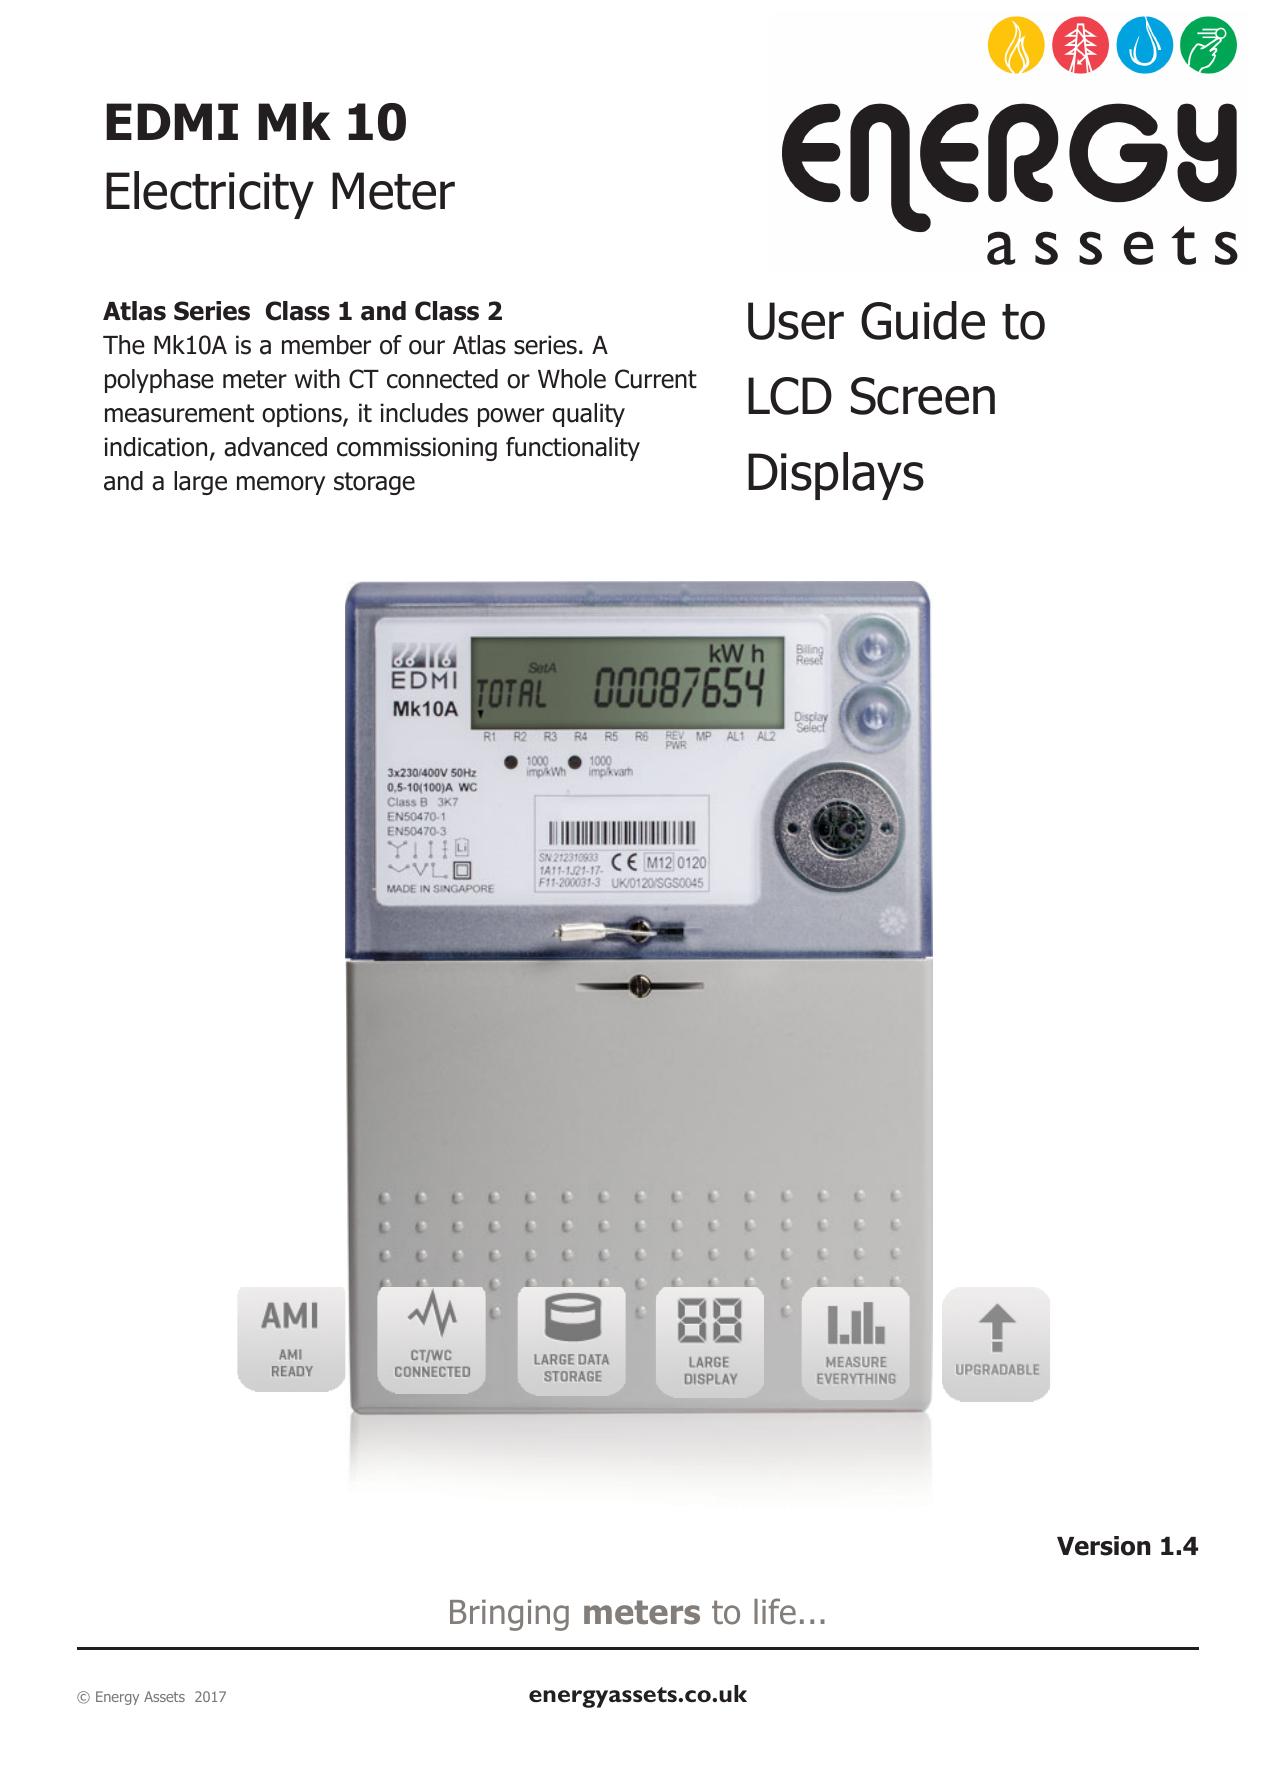 Test Meters & Detectors EDMI Electricity ATLAS Meter Mk10D 10 415 ...